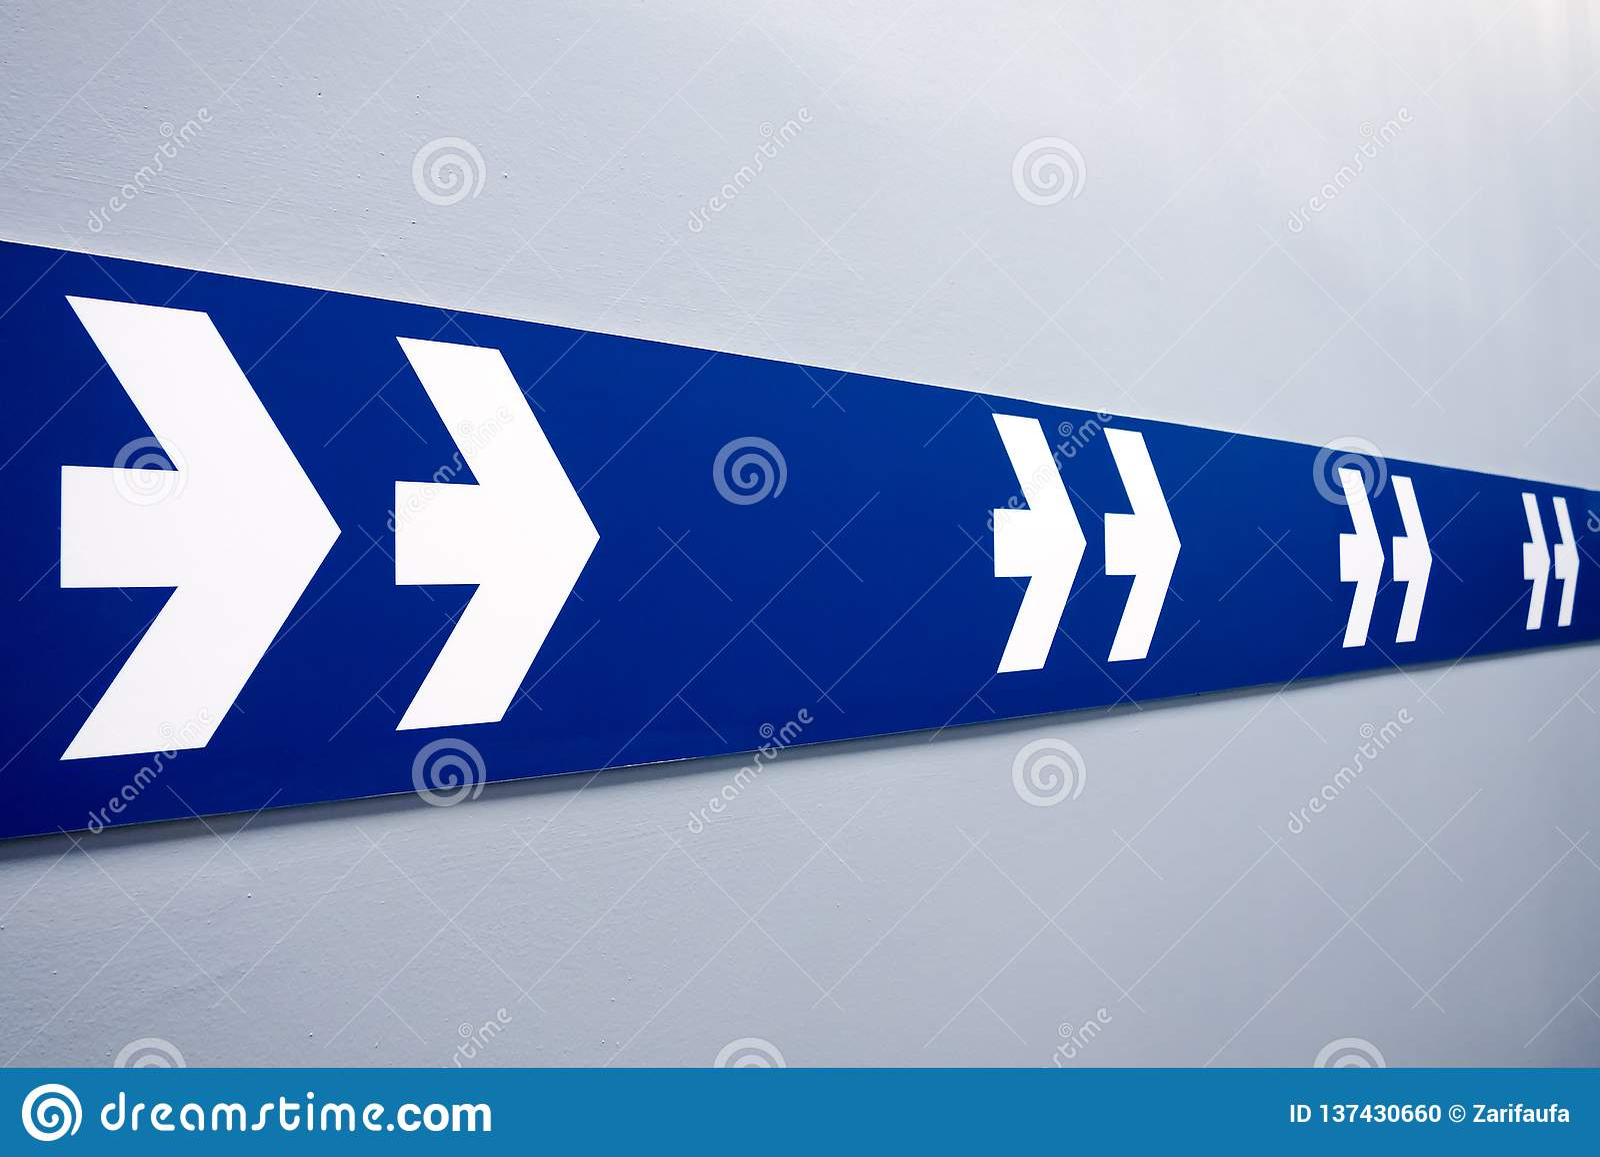 Las flechas blancas dobles firman en la tira azul que señala para salir